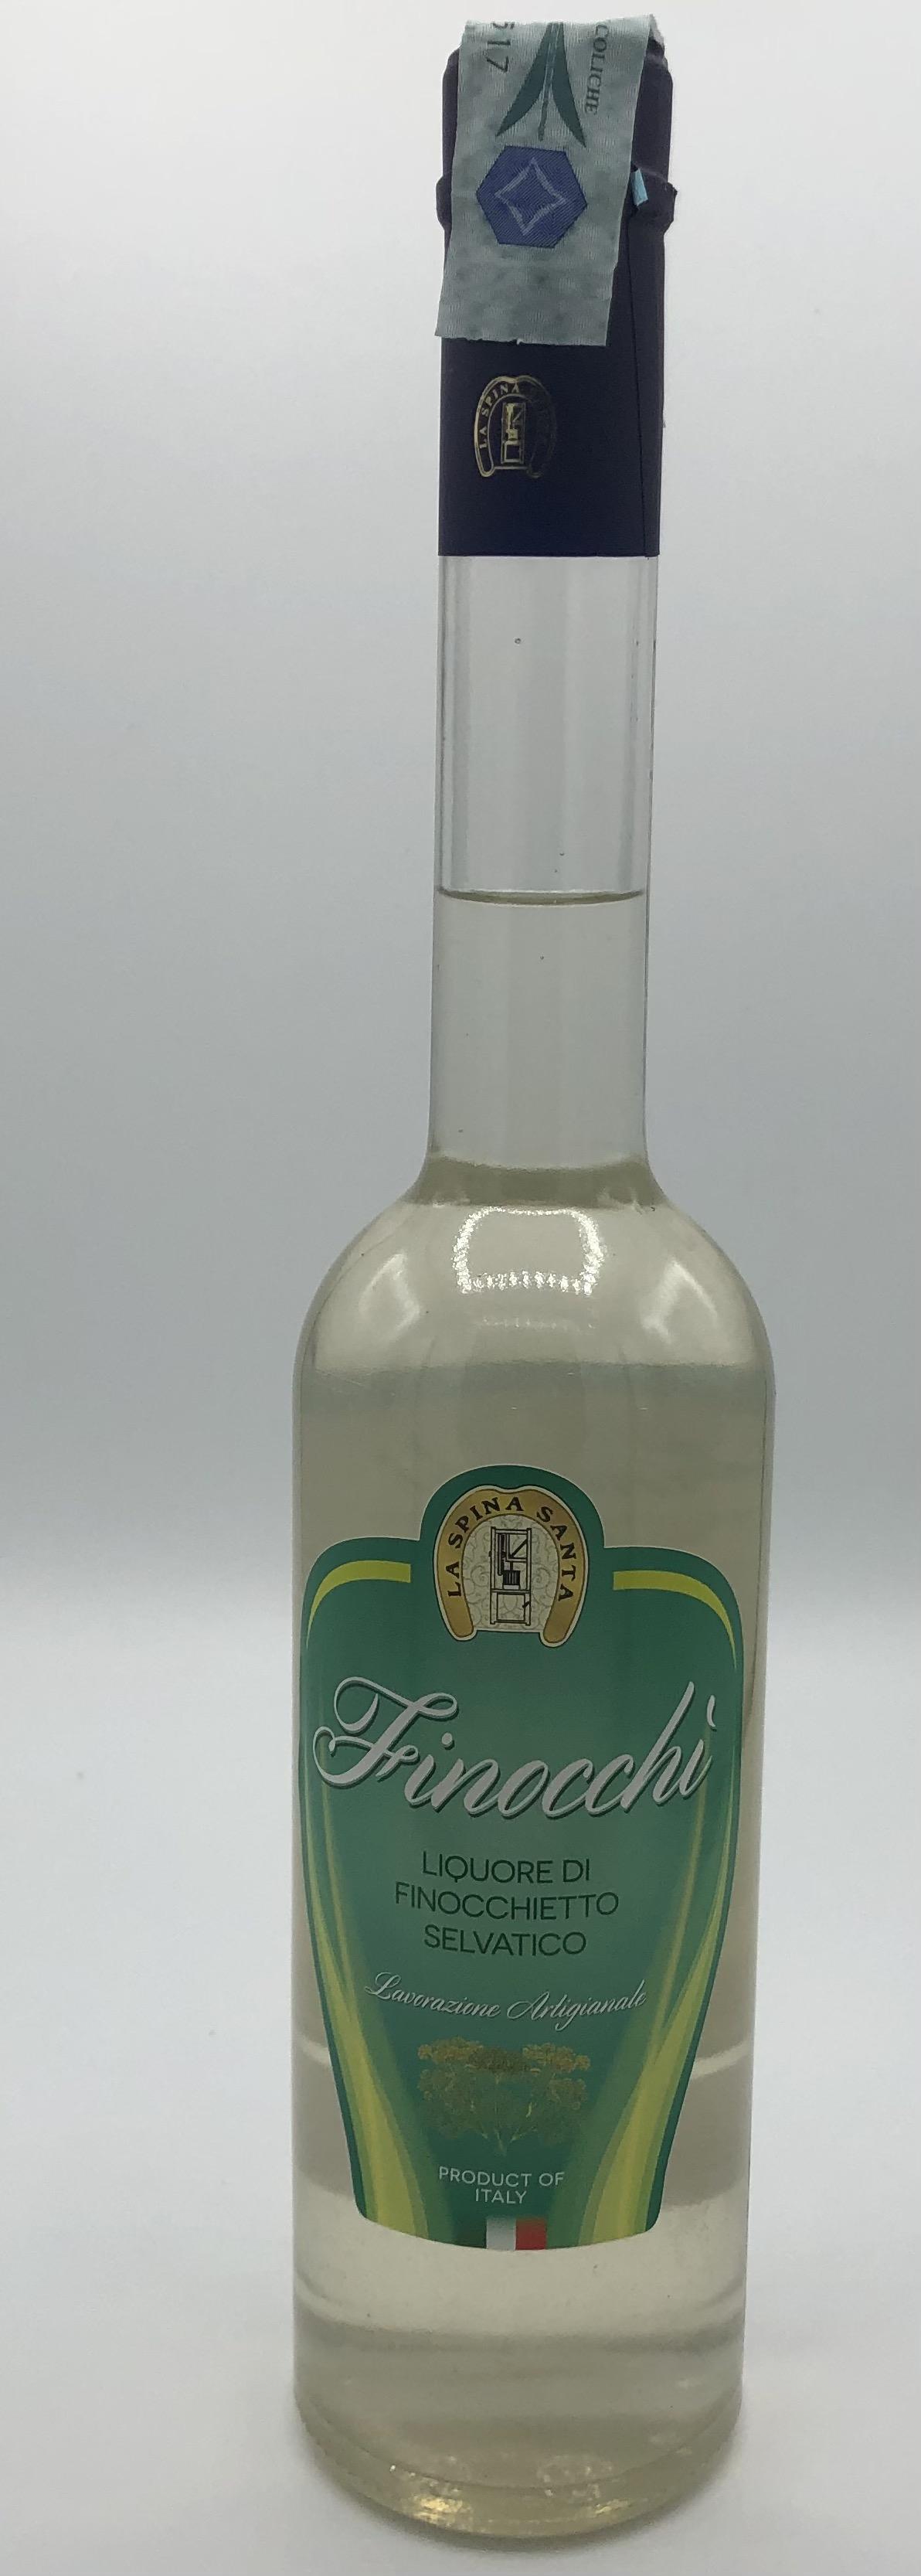 Liquore La Spina Santa Finocchì CL.50